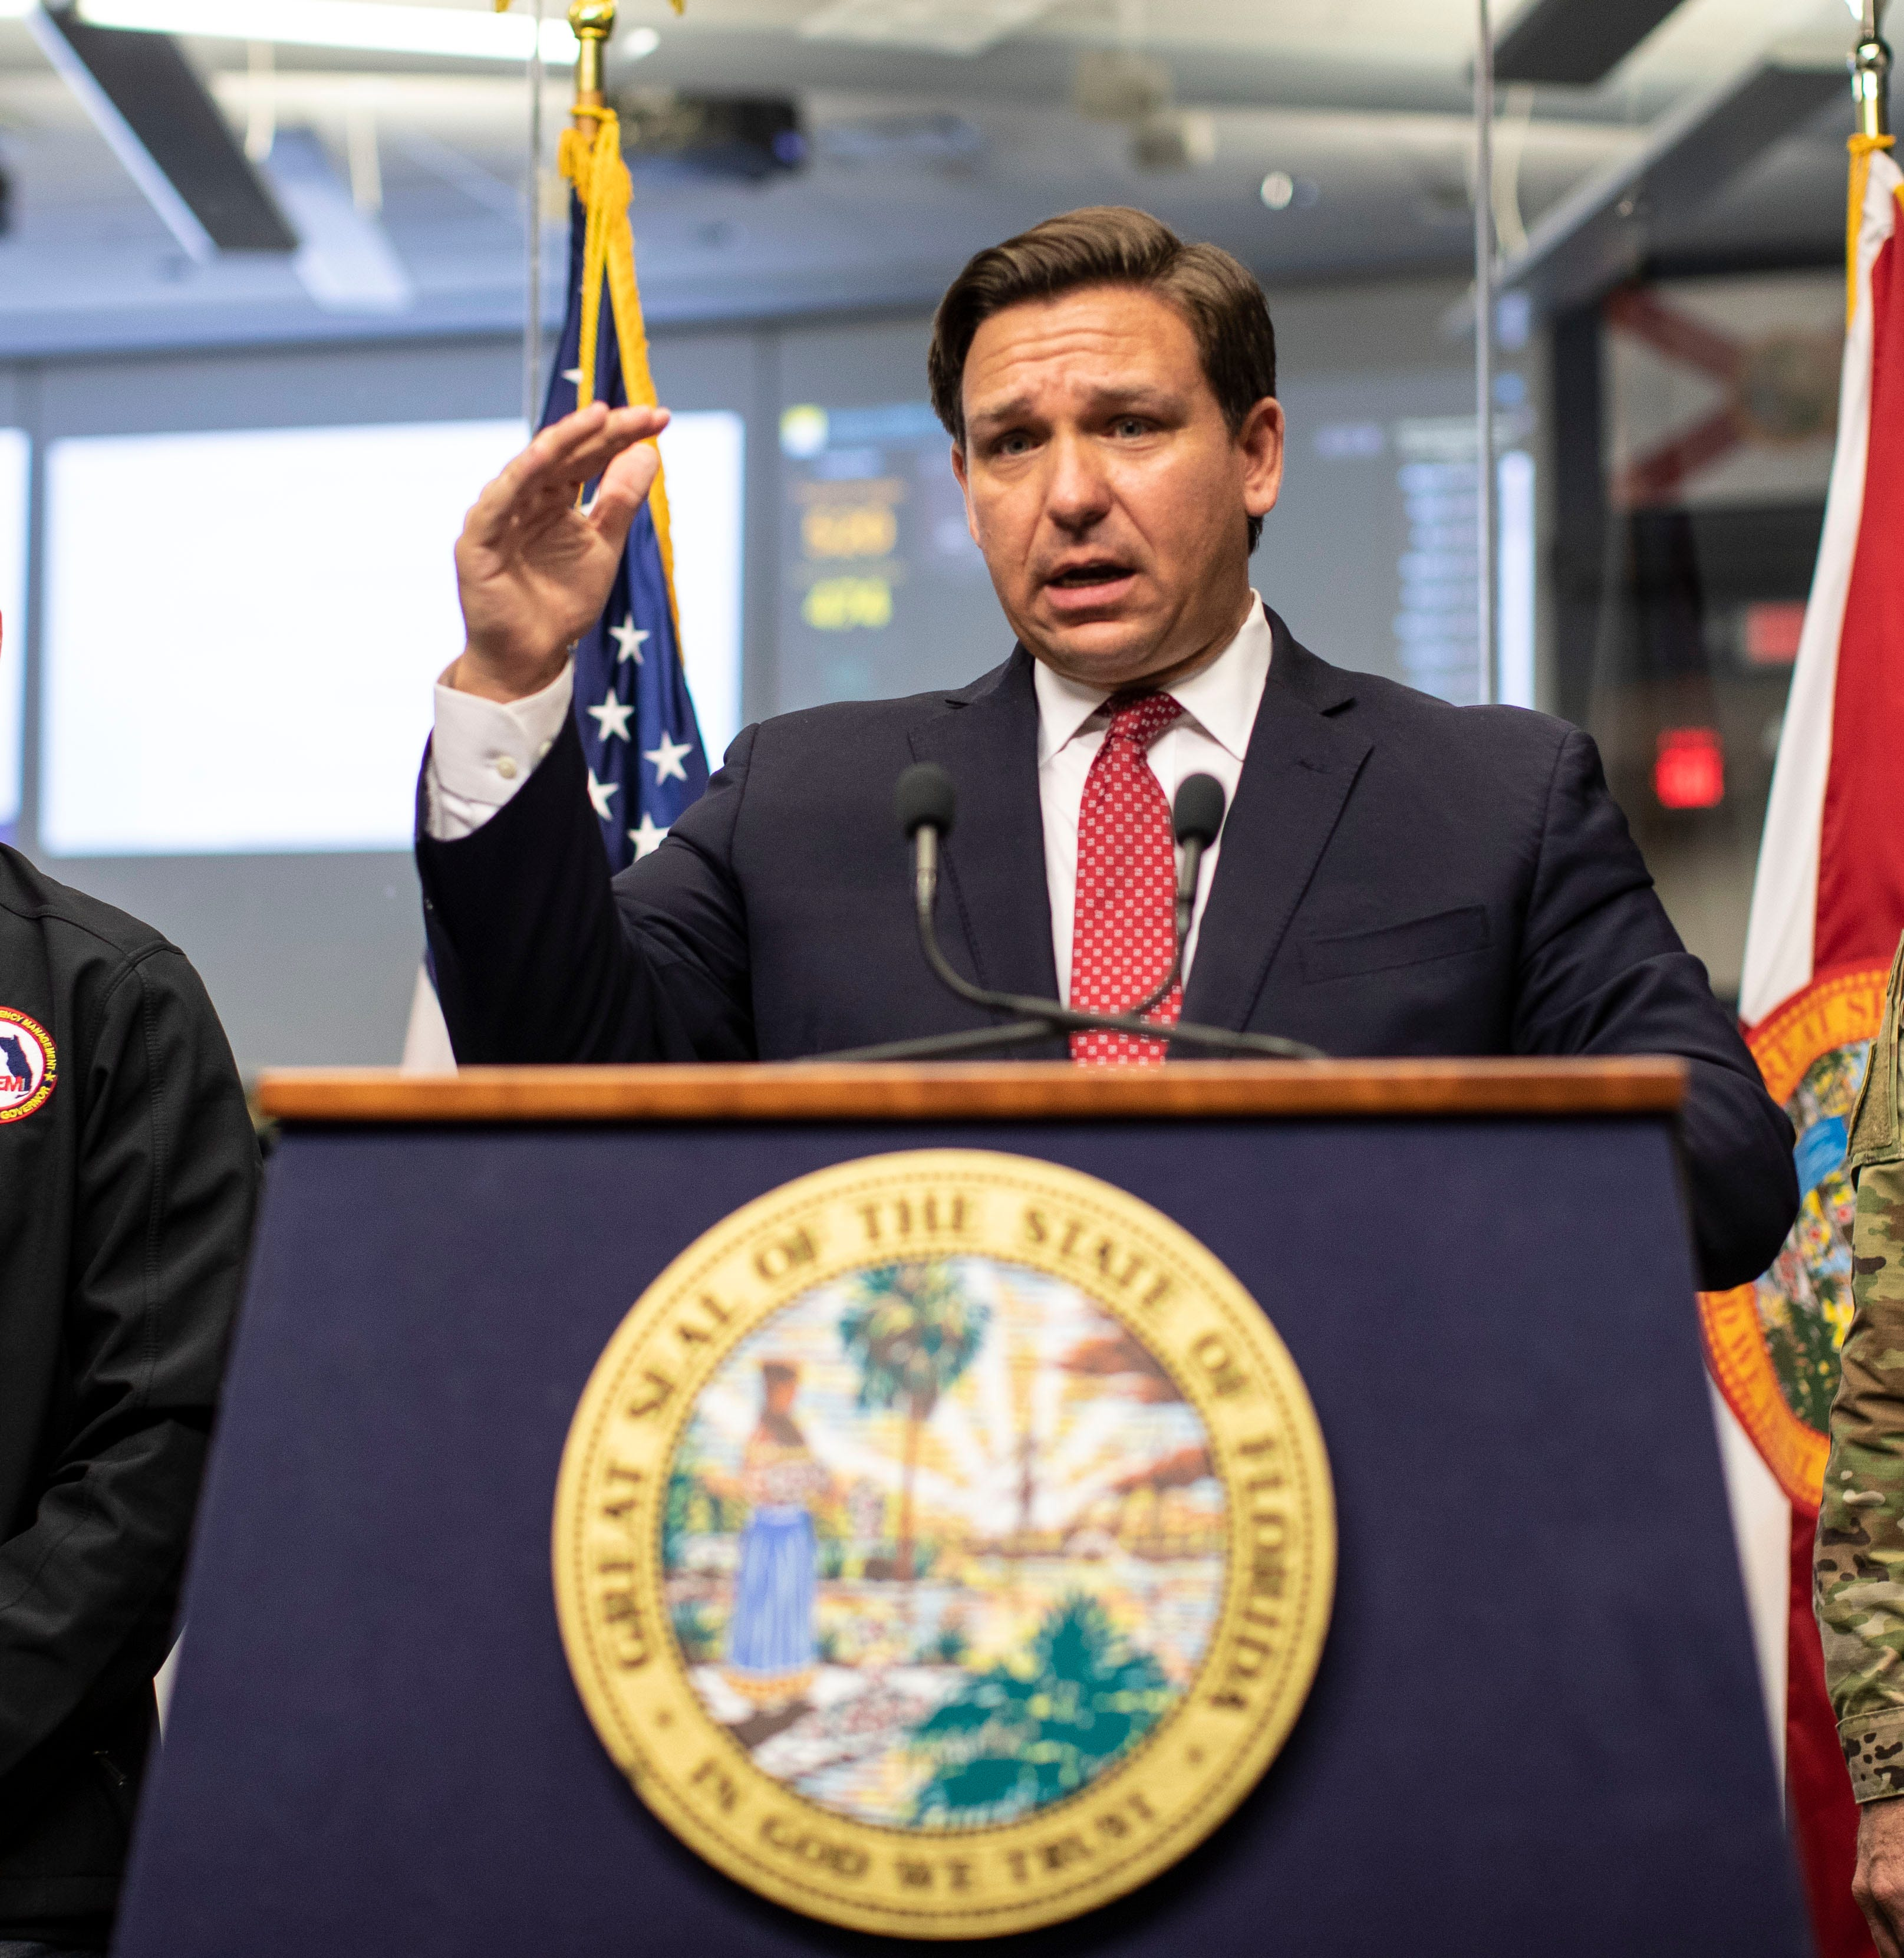 Florida coronavirus cases pass 4000: state border checkpoints begin, vacation rentals halted